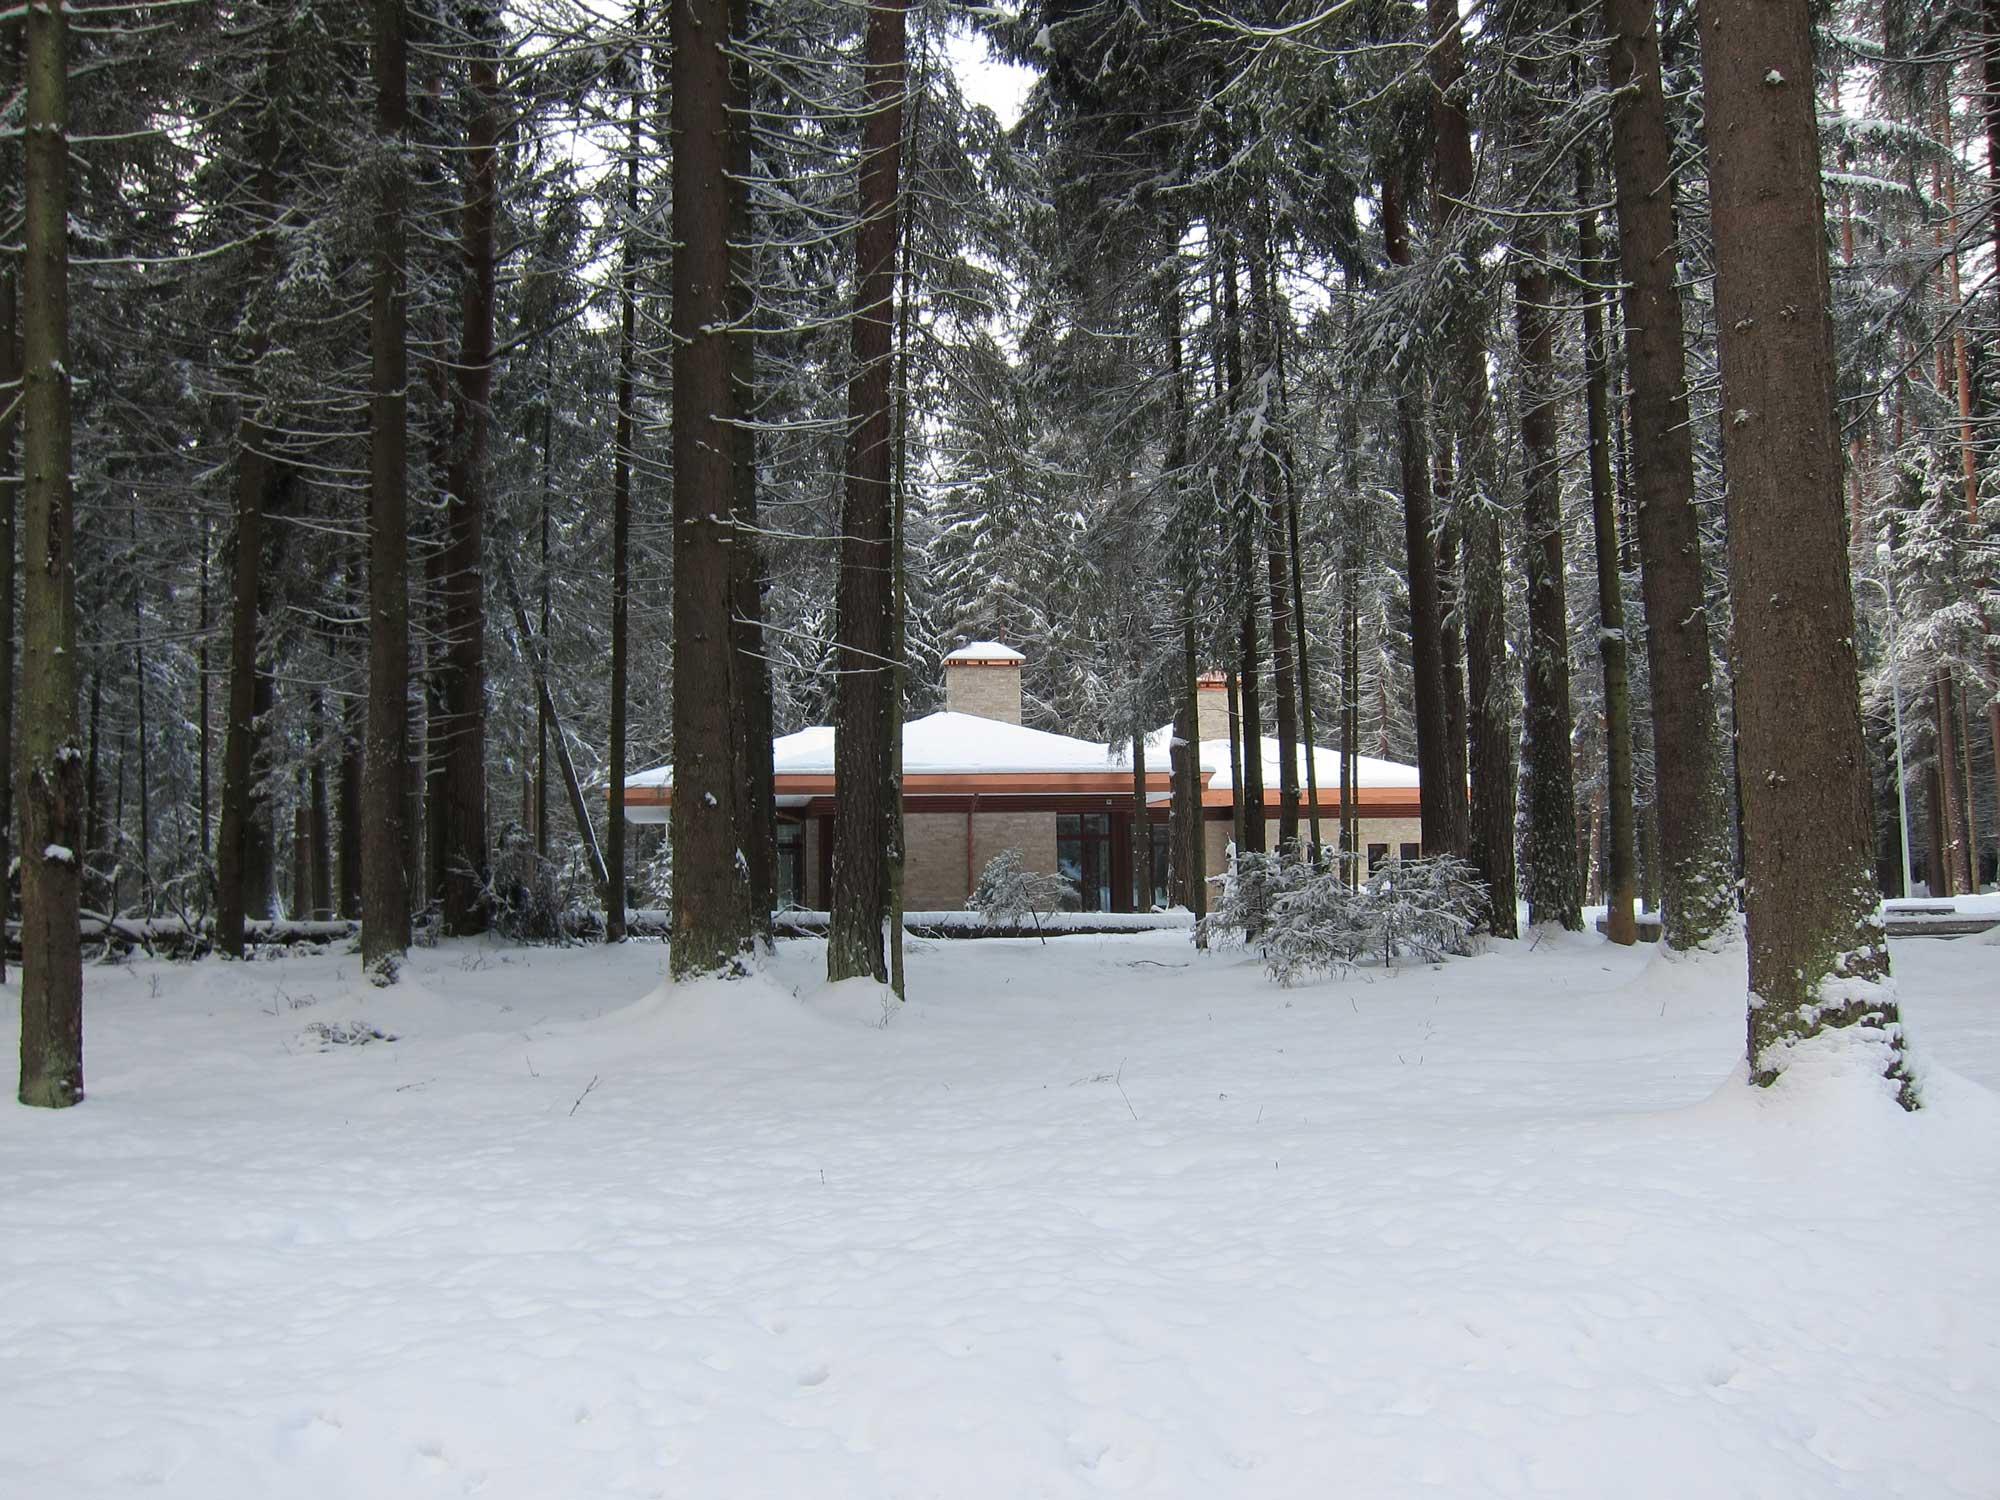 Rehabilitacioni centar Maslovo, Maslovo, Rusija